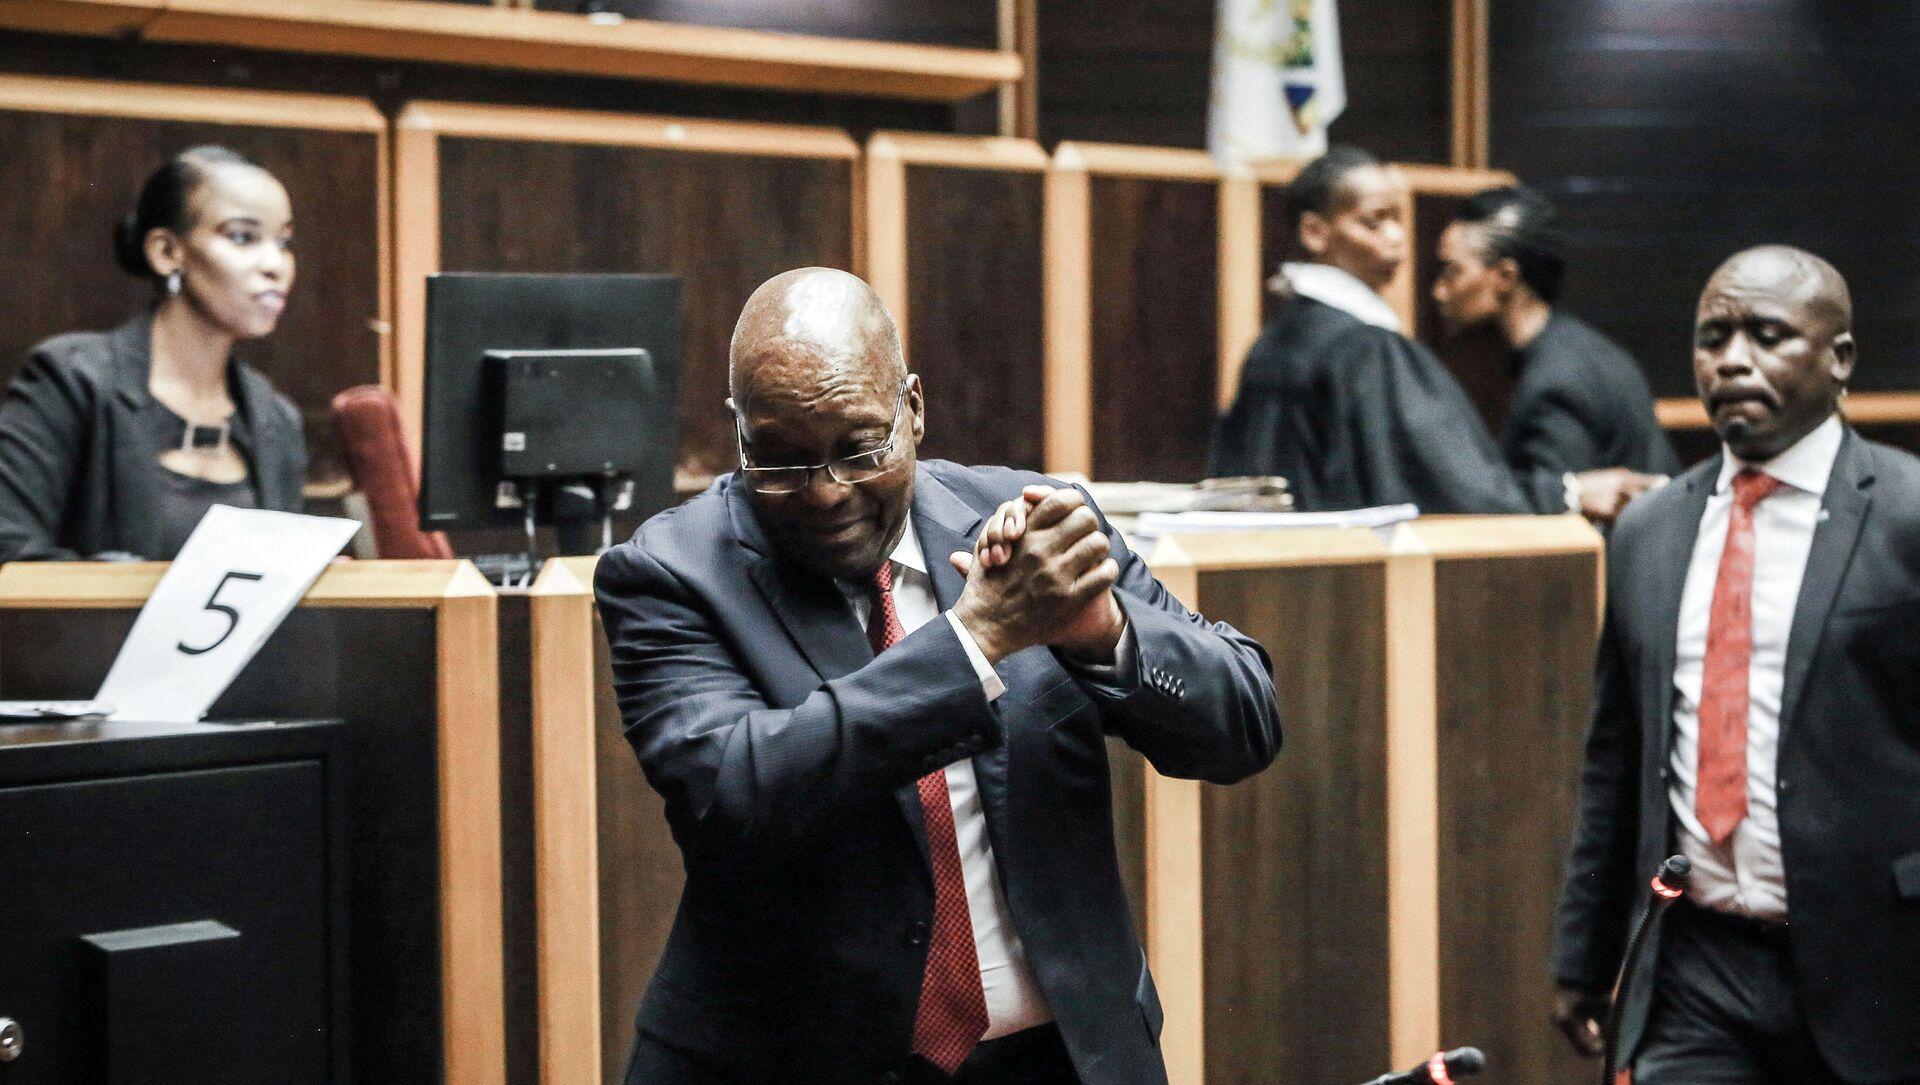 Jacob Zuma, l'ancien président sud-africain - Sputnik France, 1920, 07.09.2021